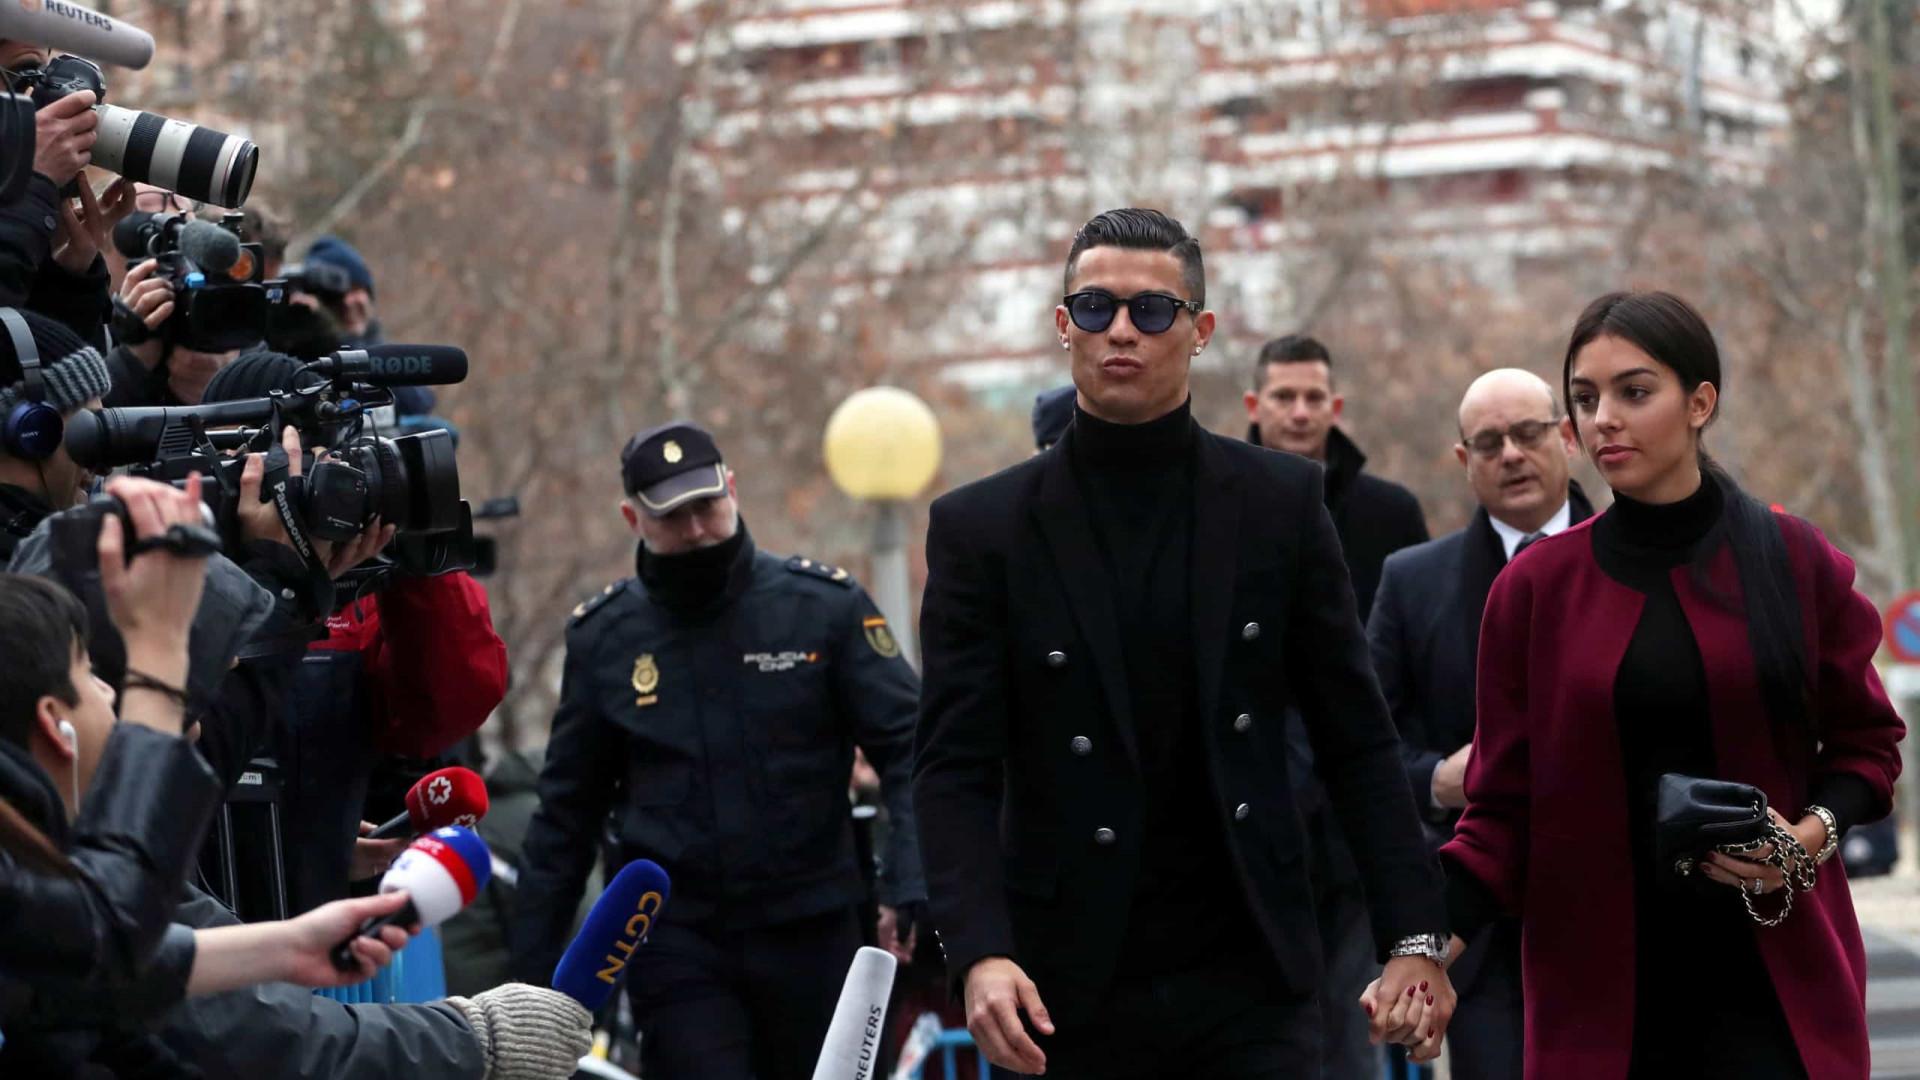 Katheryn Mayorga retira queixa de estupro contra Cristiano Ronaldo